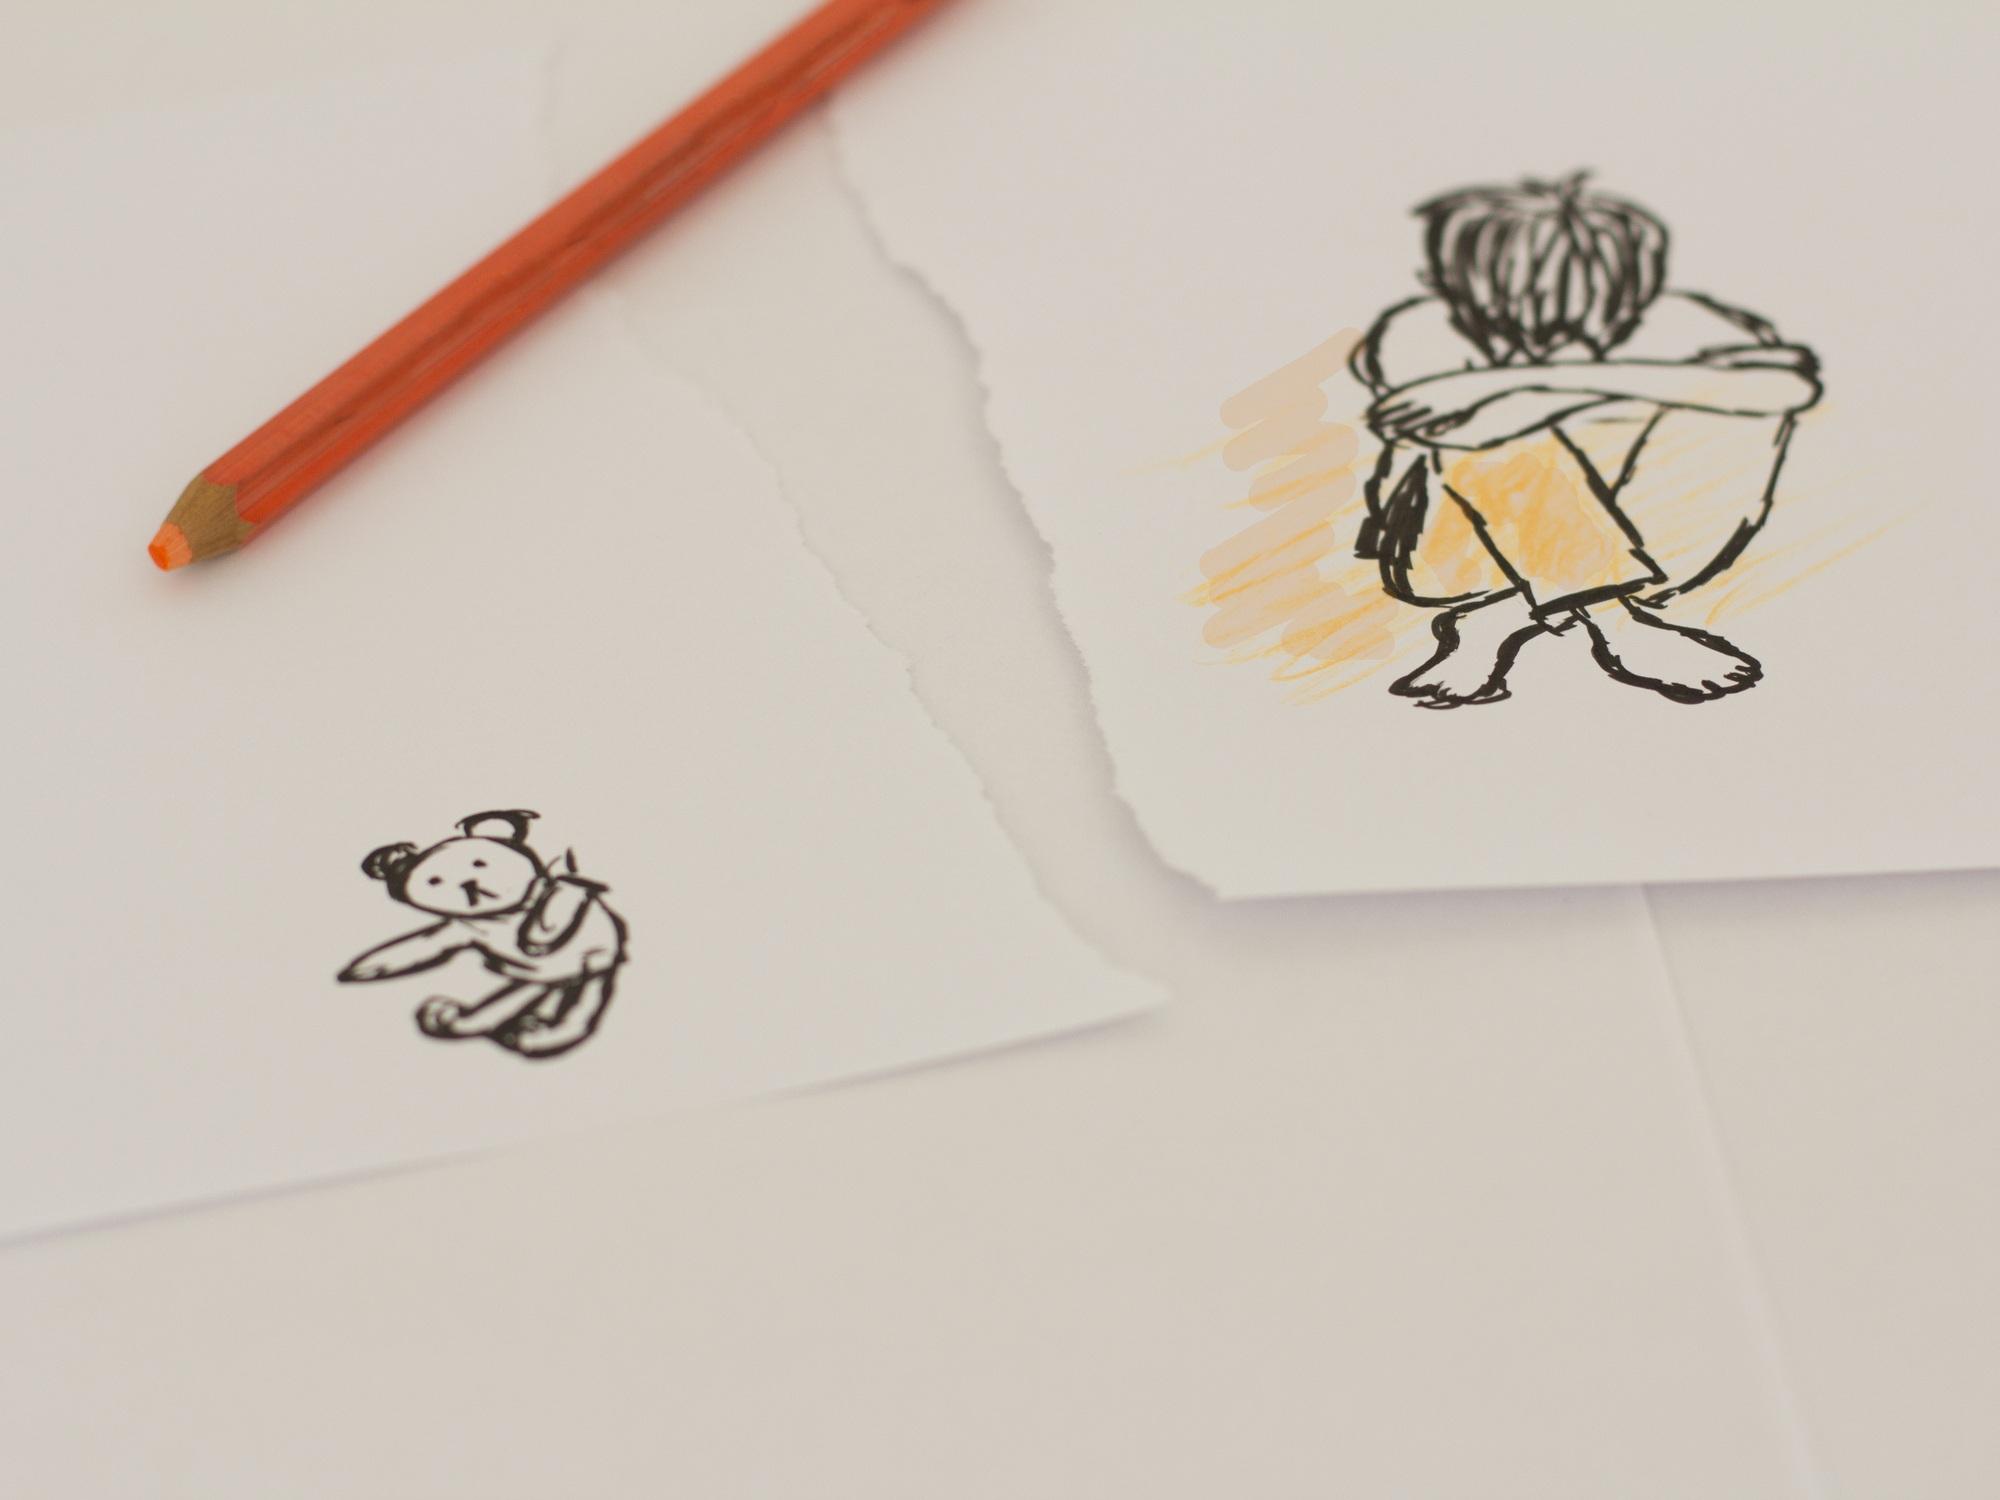 Gambar Penulisan Tangan Sendirian Pola Anak Kesepian Merek